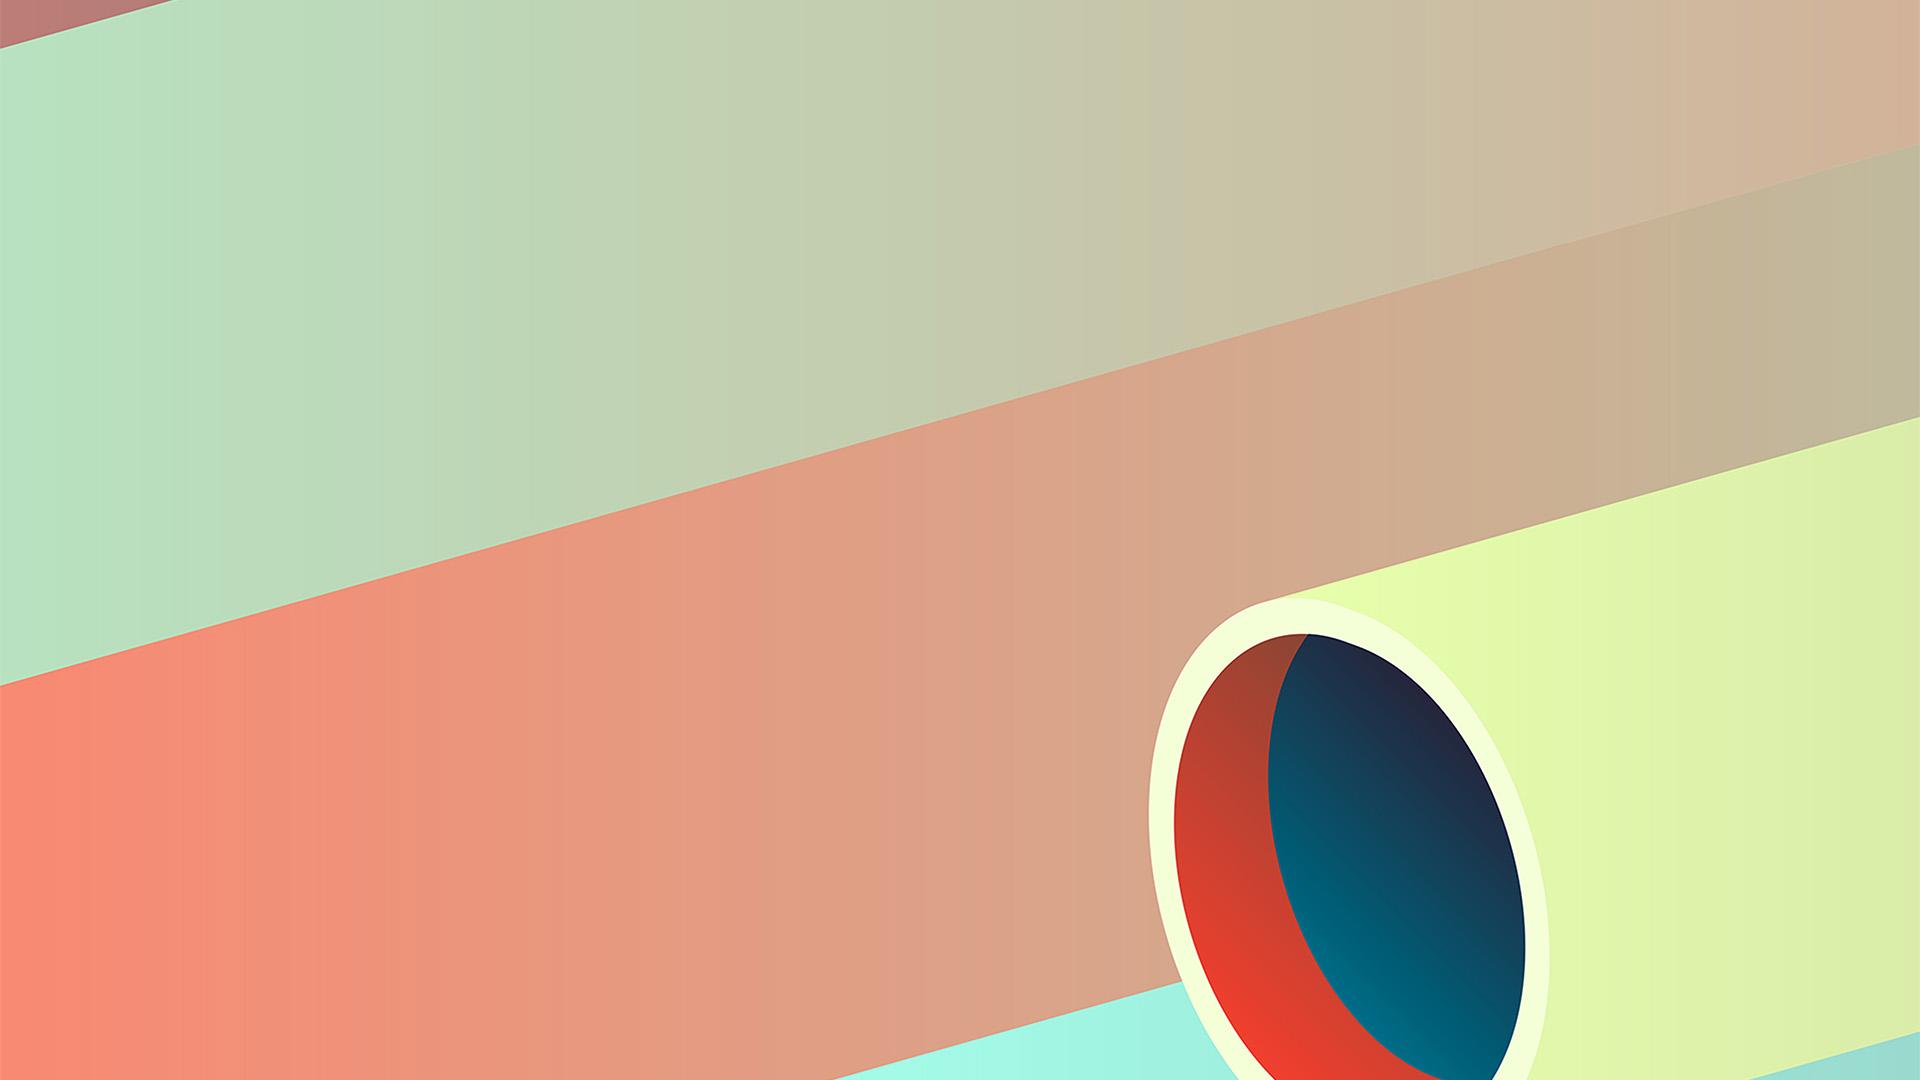 vz27colorflatdigitalabstractpatternbackgroundwallpaper